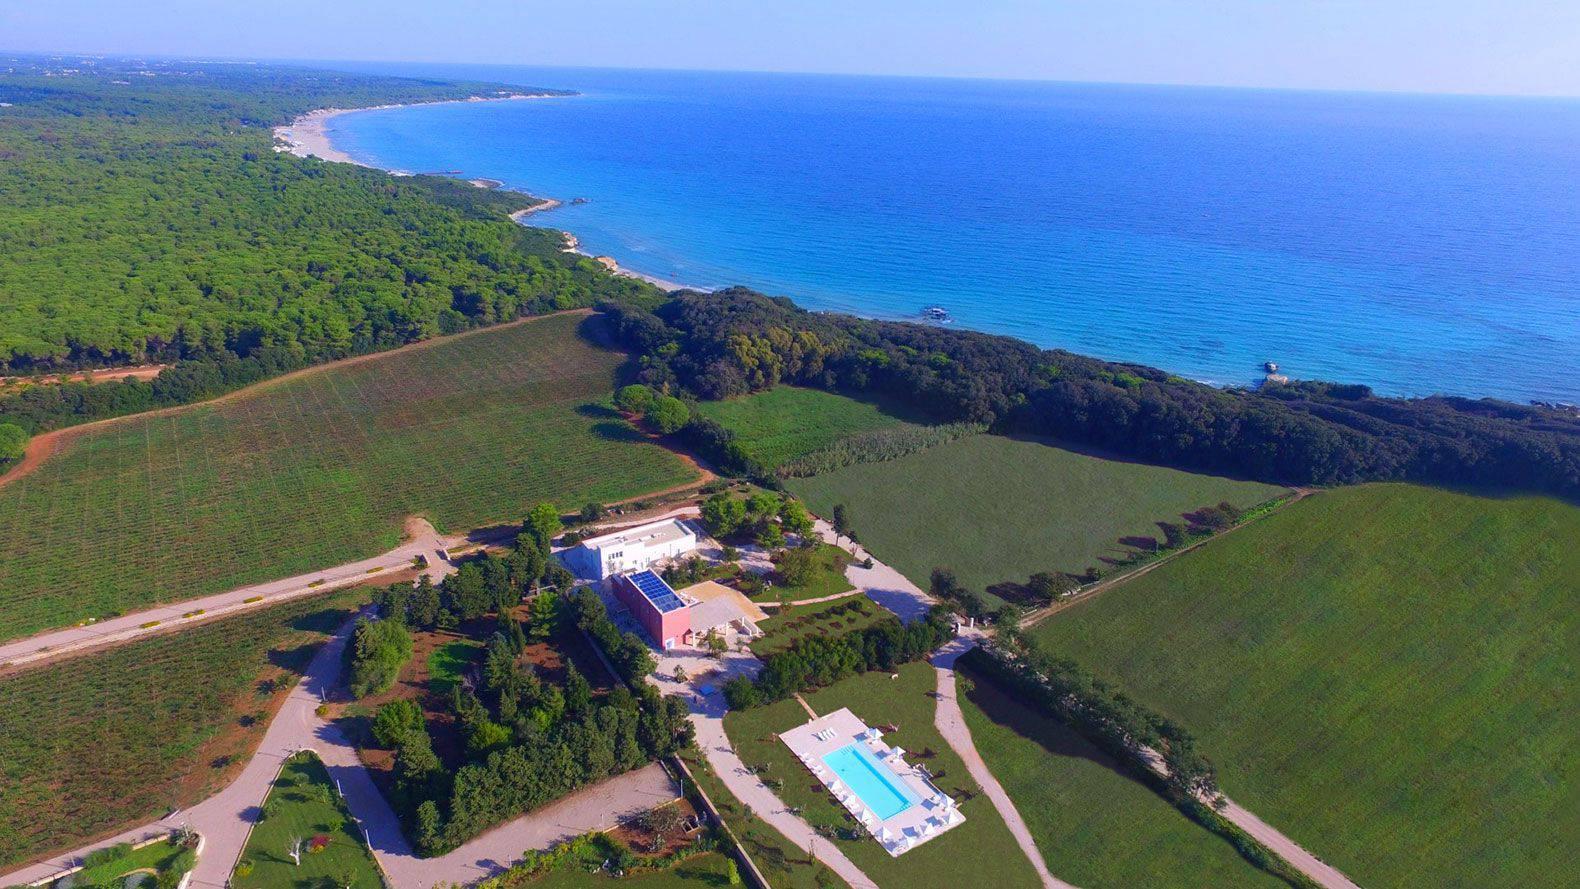 Masseria Mongiò Baia dei Turchi Otranto